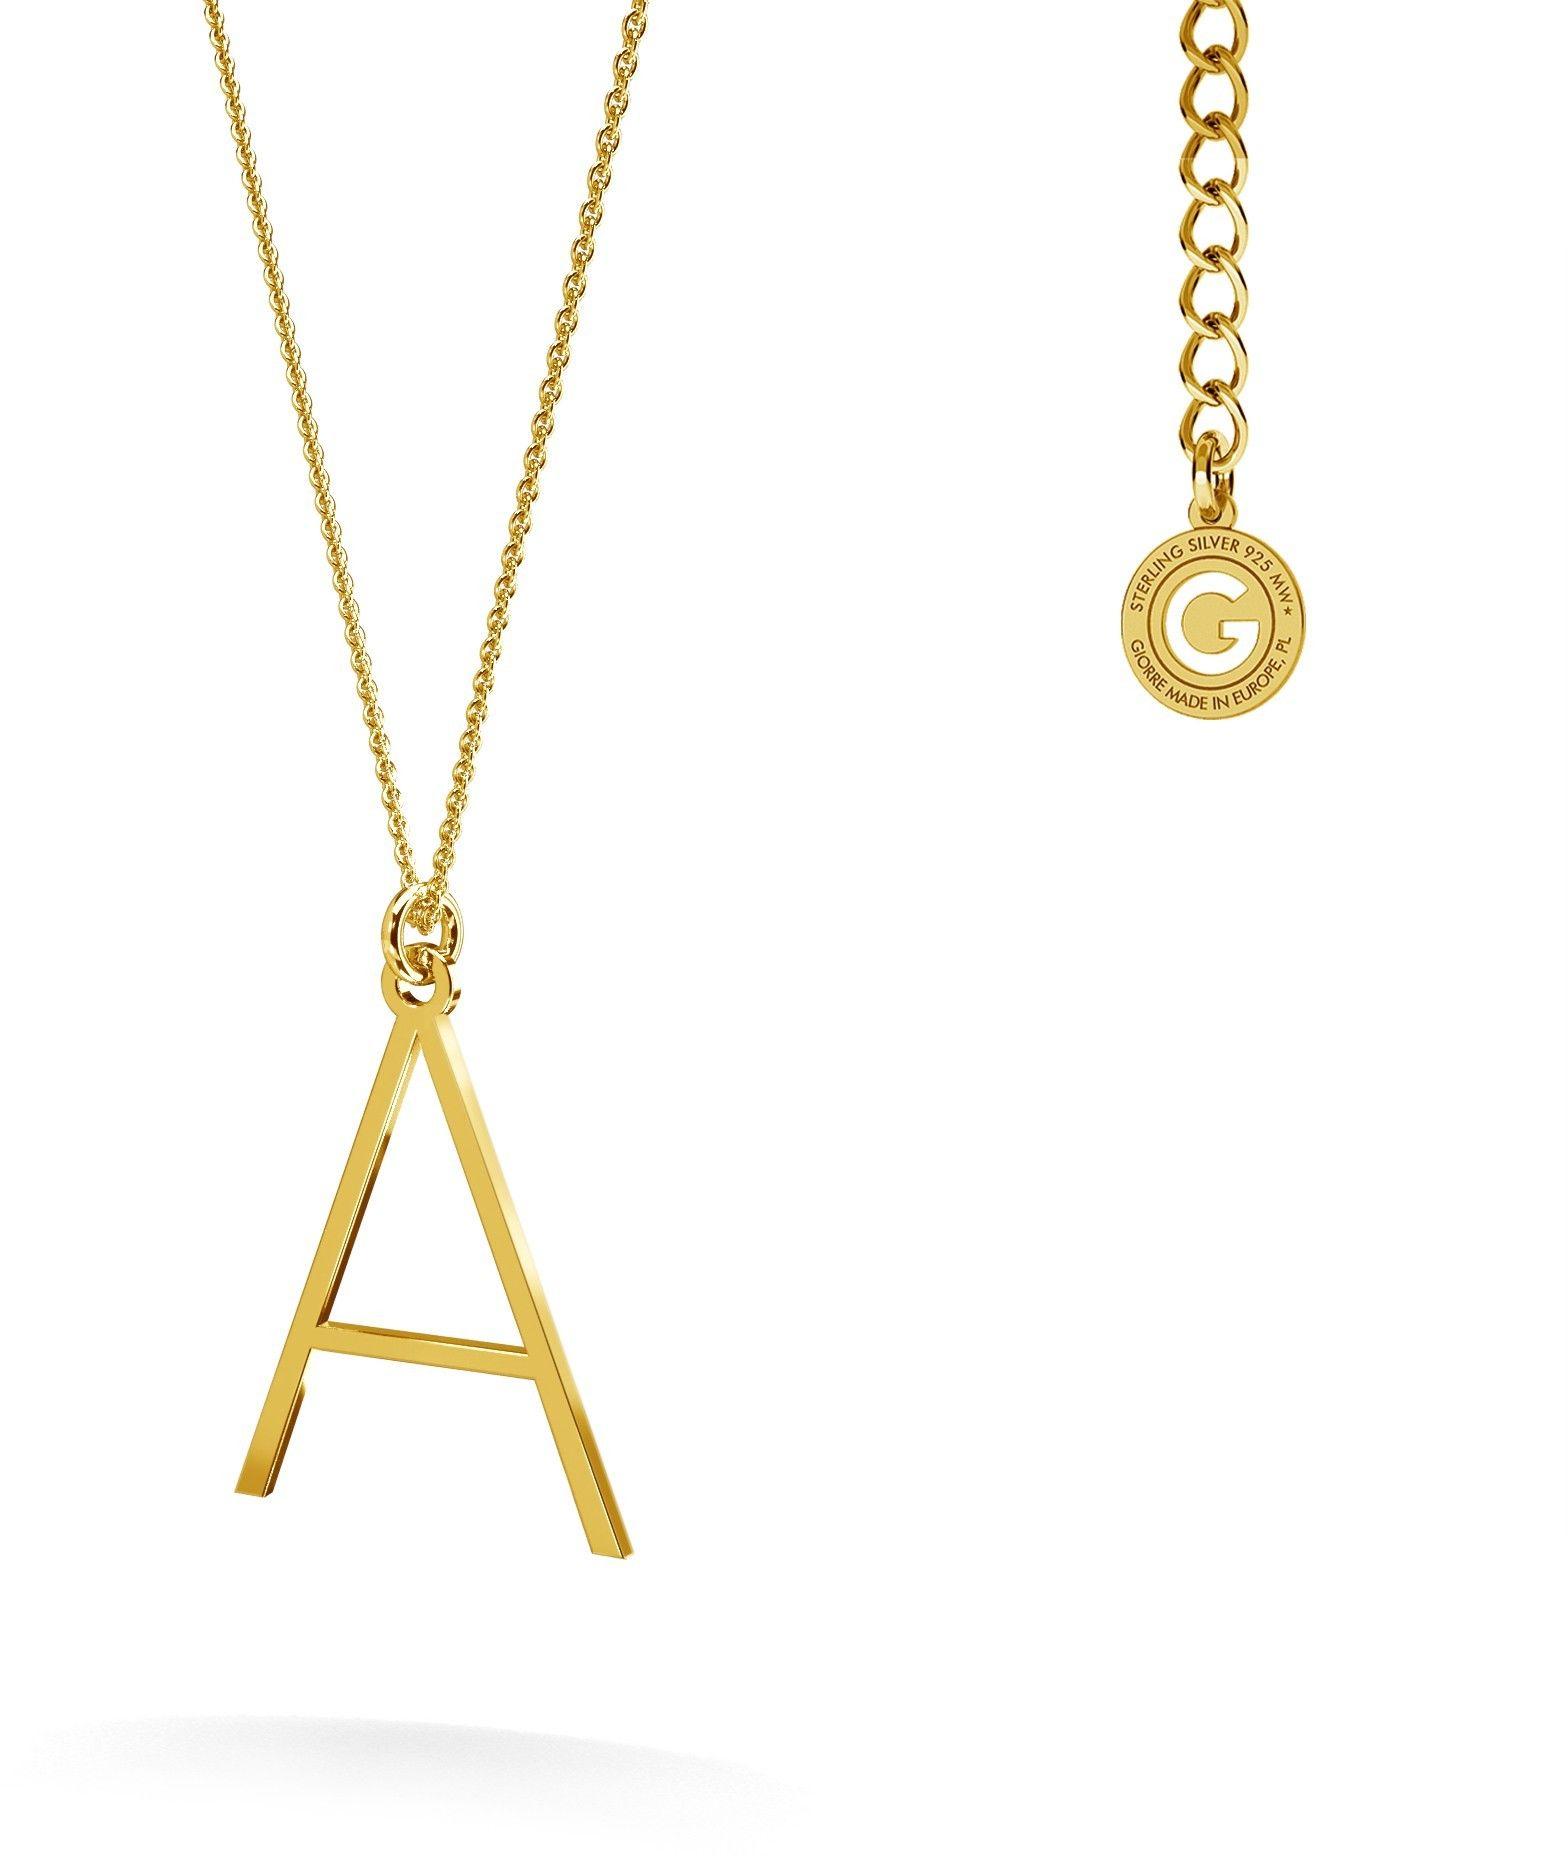 Srebrny naszyjnik z literką, alfabet, srebro 925 : Litera - P, Srebro - kolor pokrycia - Pokrycie platyną